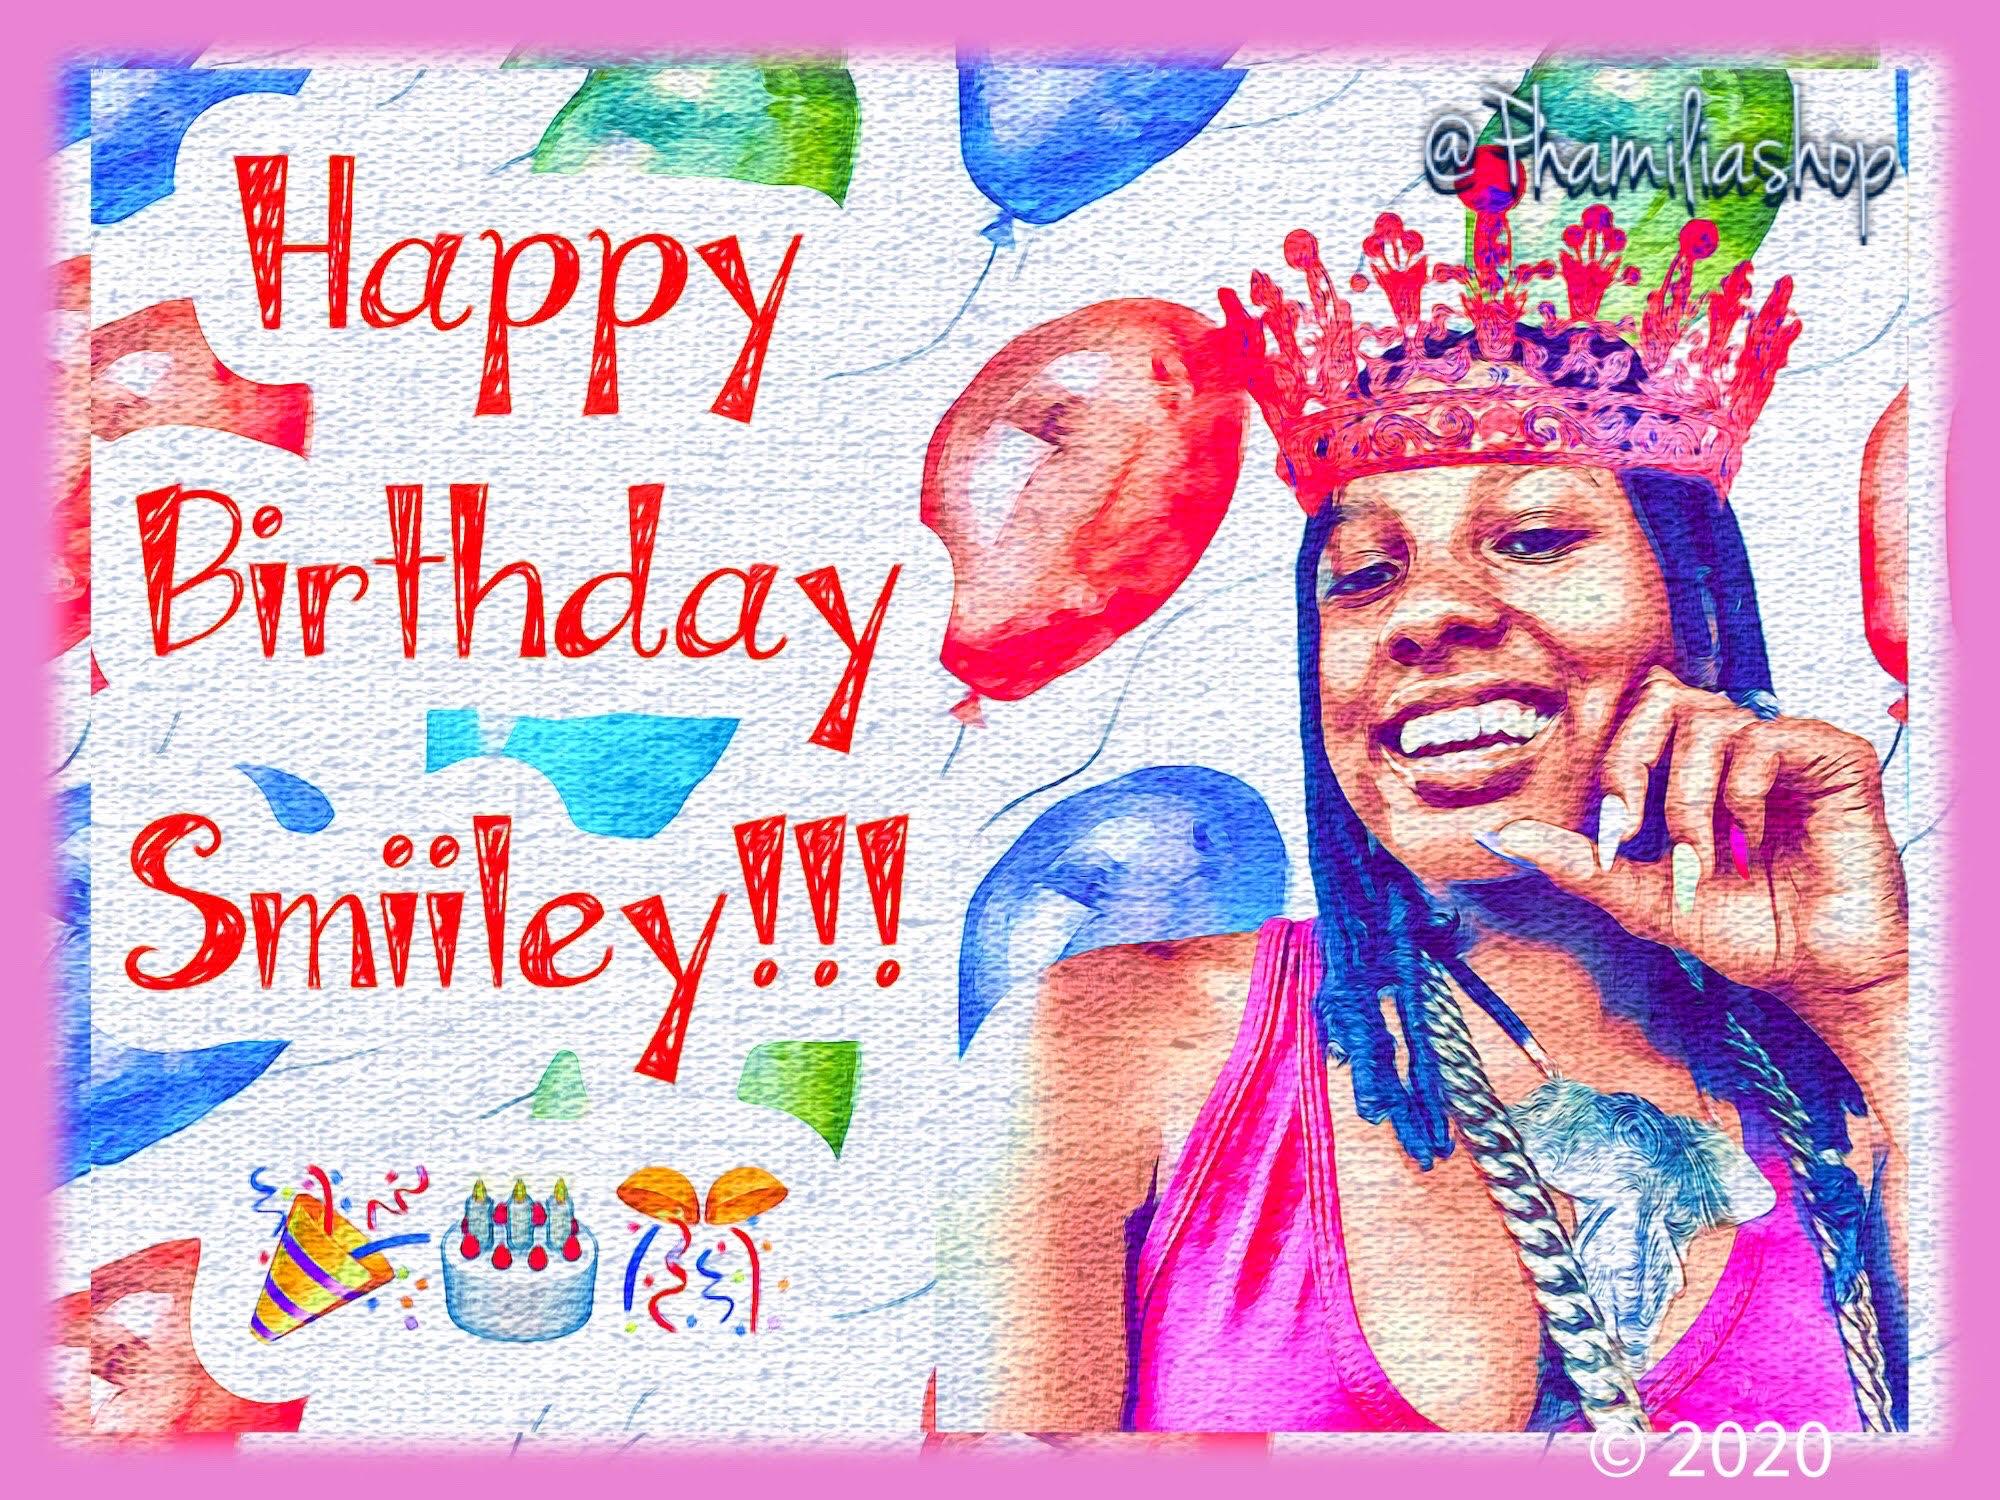 Happy Birthday Smiiley